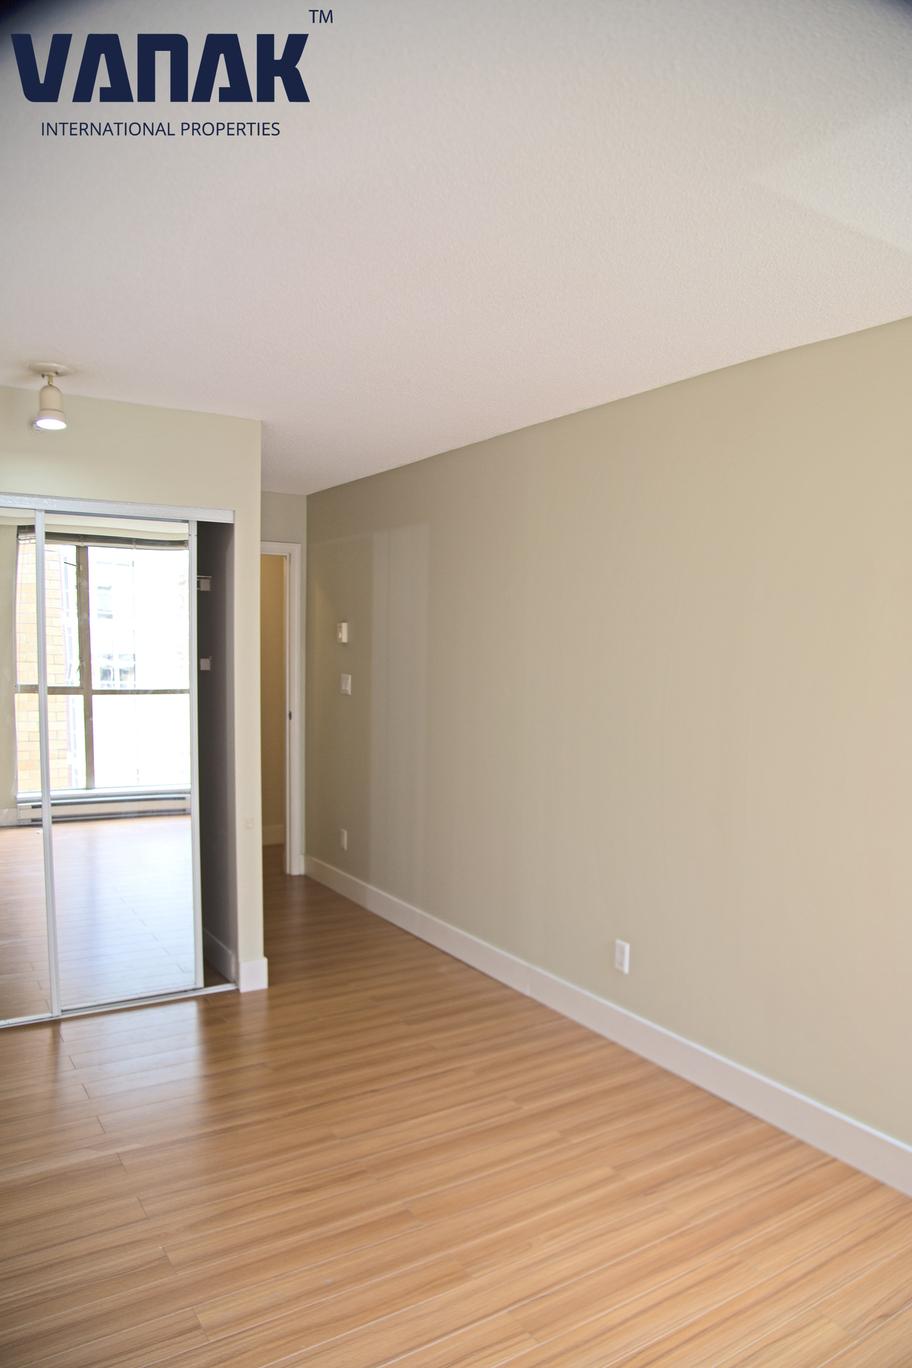 822 Homer,Vancouver,BC,Canada,2 Bedrooms Bedrooms,2 BathroomsBathrooms,Apartment,Galileo,Homer,8,1458